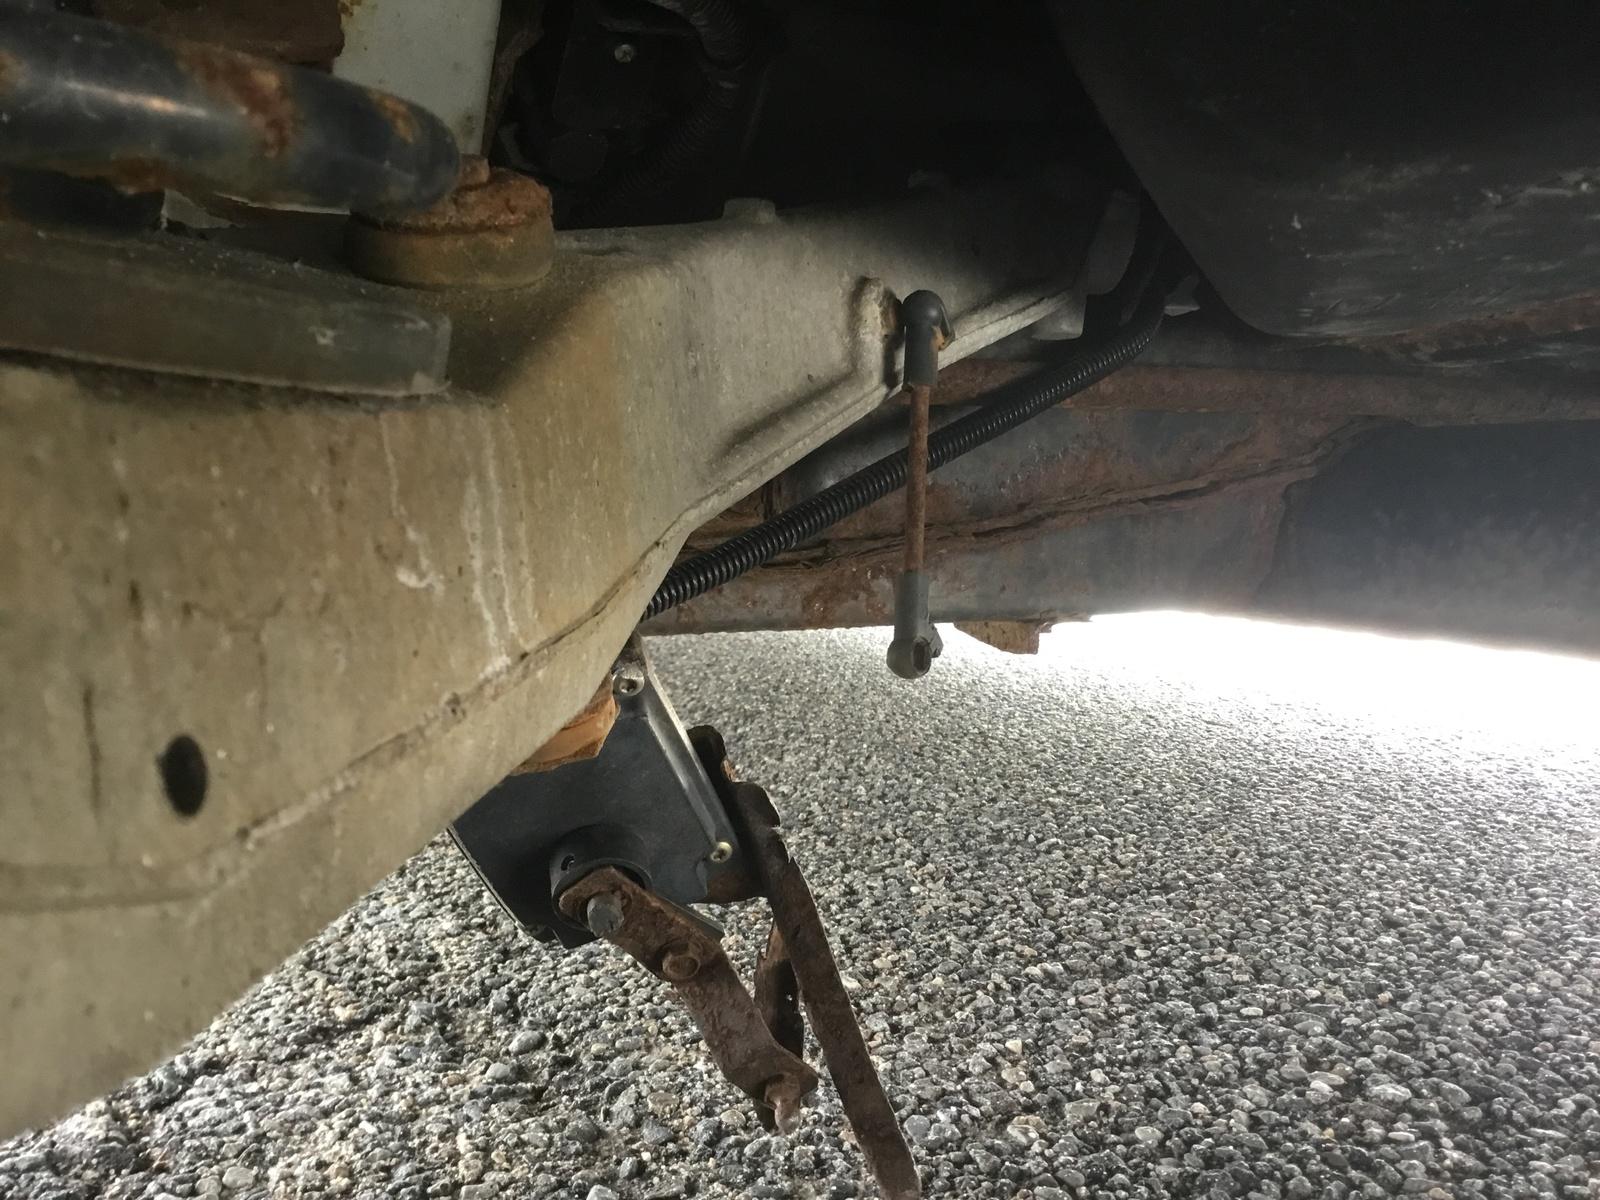 Buick Park Avenue Questions - Rustetpart hanging - CarGurus on buick fuel pump, buick lesabre fuse panel diagram, buick hubcap, buick motor mount, buick fuse block, buick wiper arm, buick air cleaner,